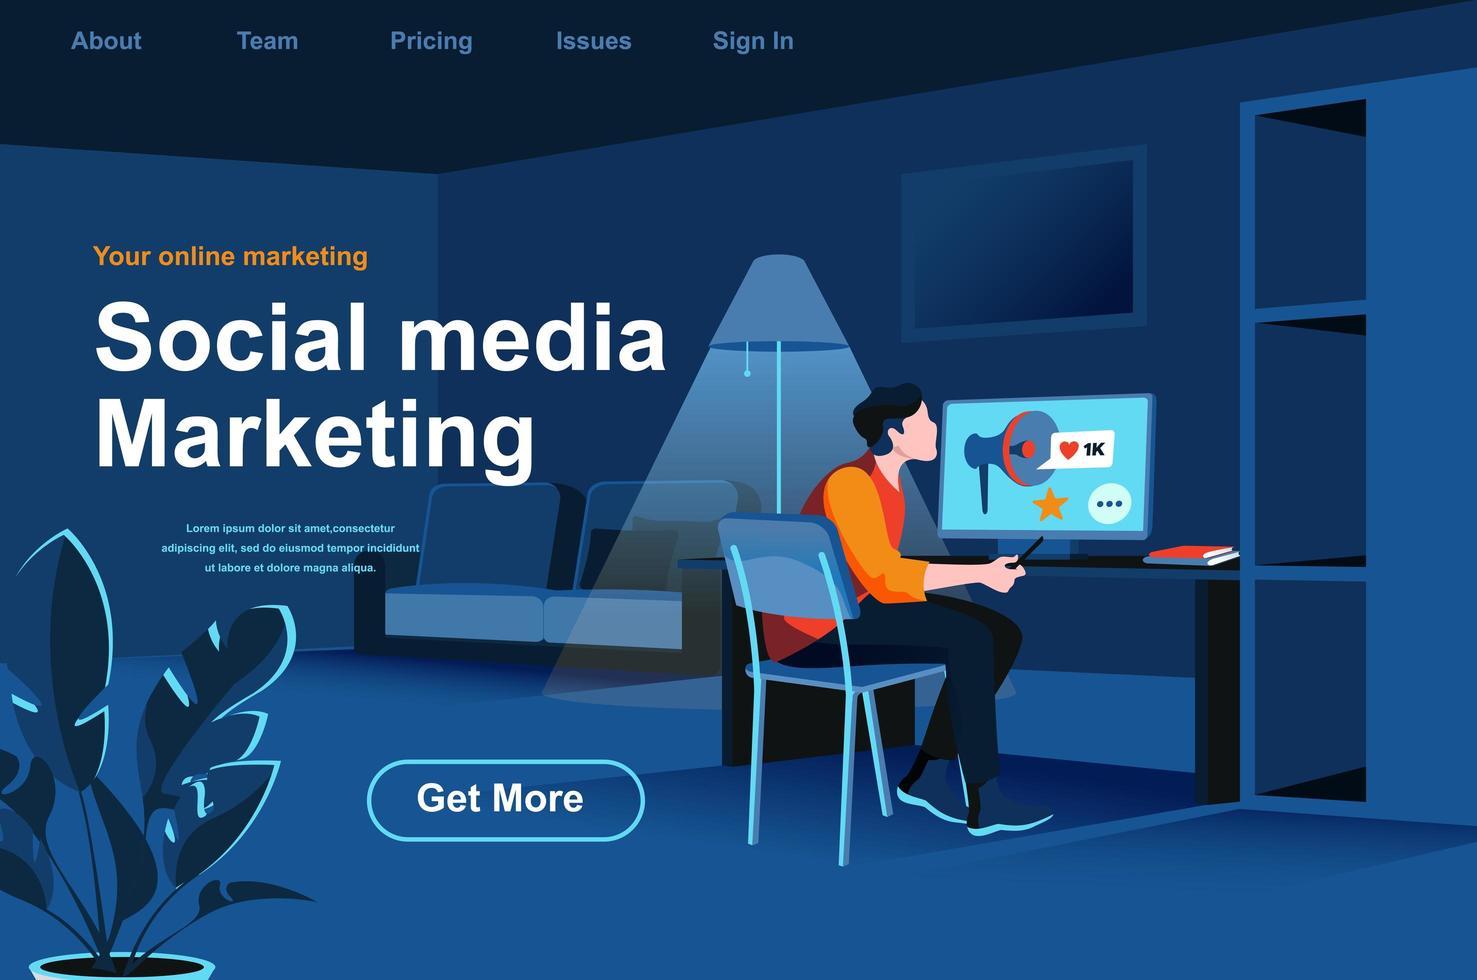 sociale media marketing isometrische bestemmingspagina. vector